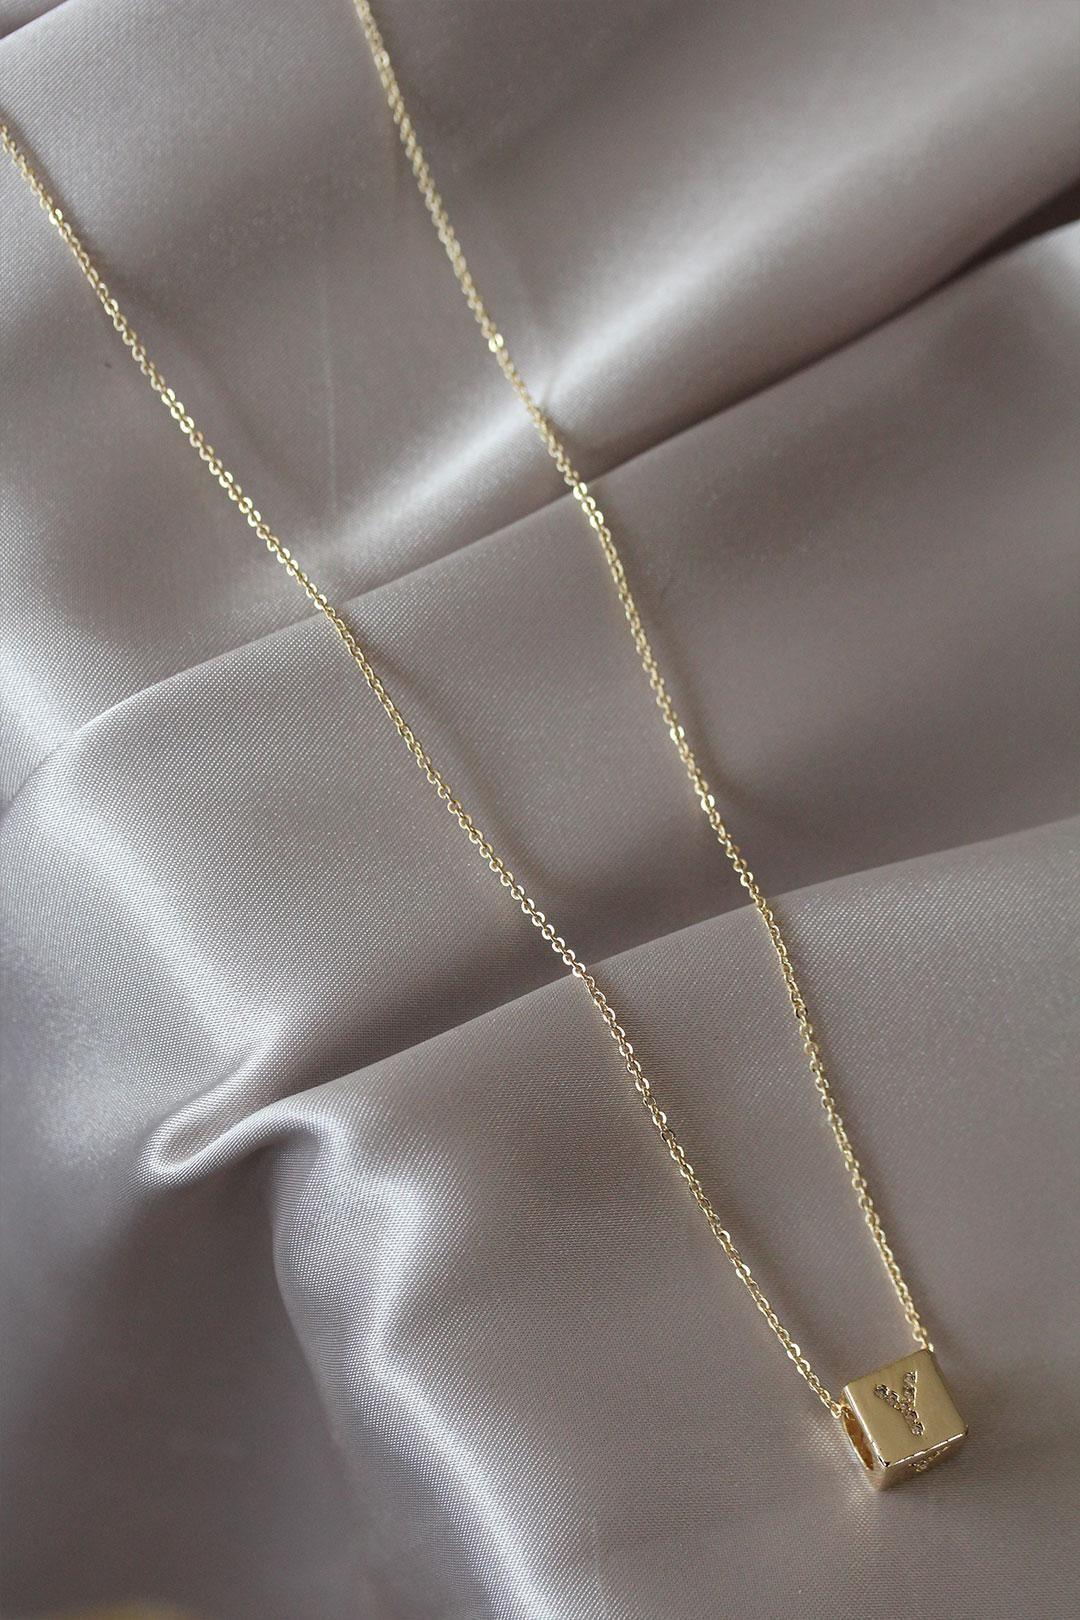 Gold Renk Zirkon Taşlı Küp Model Y Harfli Kolye